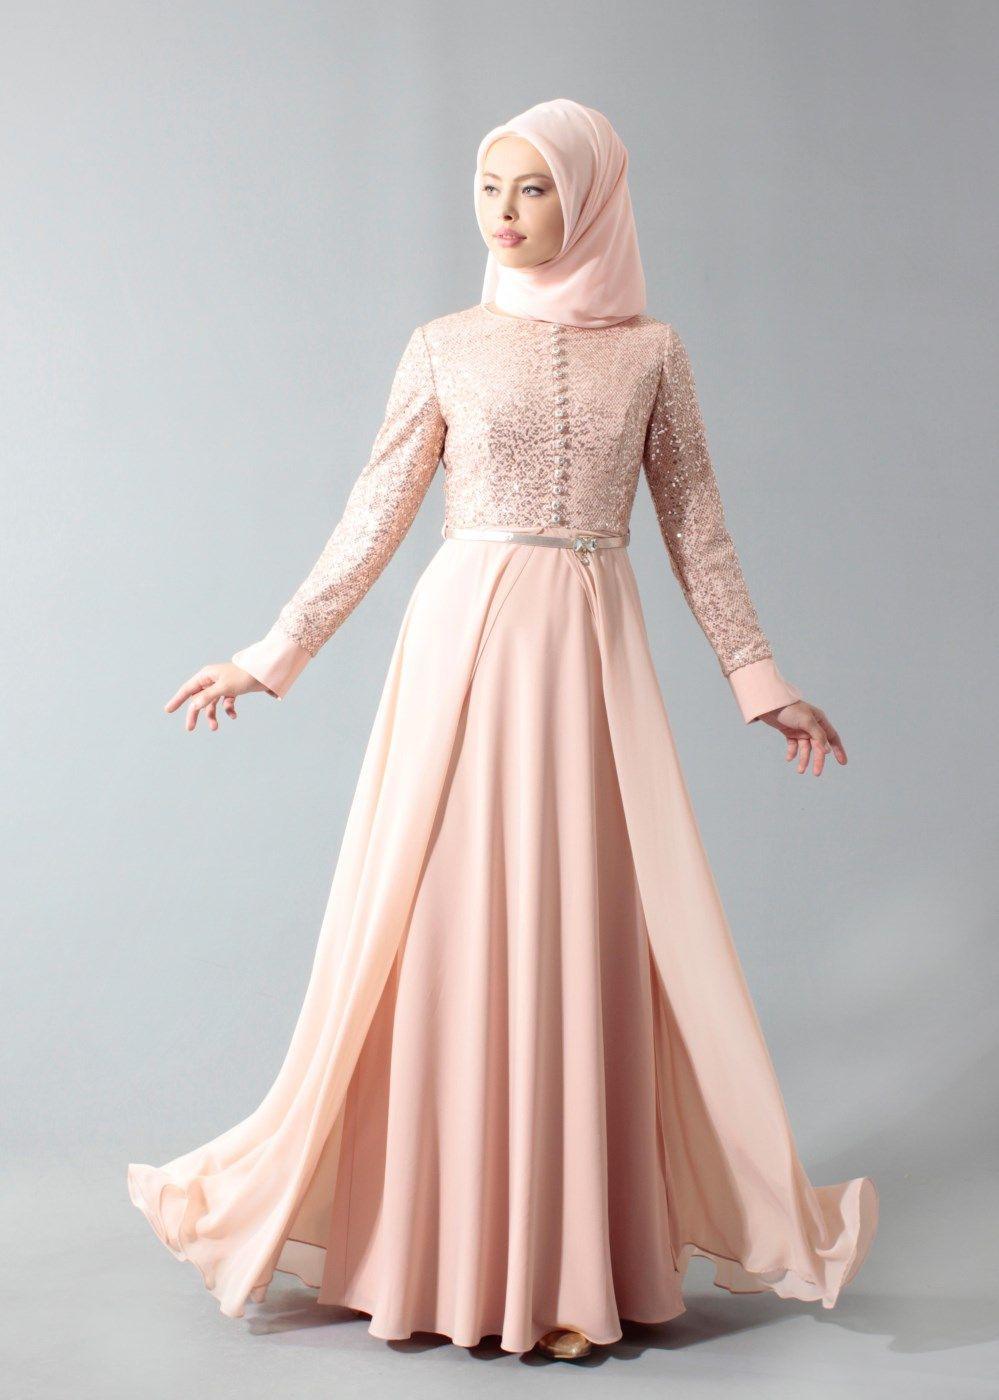 13 Einfach Abend Dress Muslimah Bester Preis20 Schön Abend Dress Muslimah Bester Preis